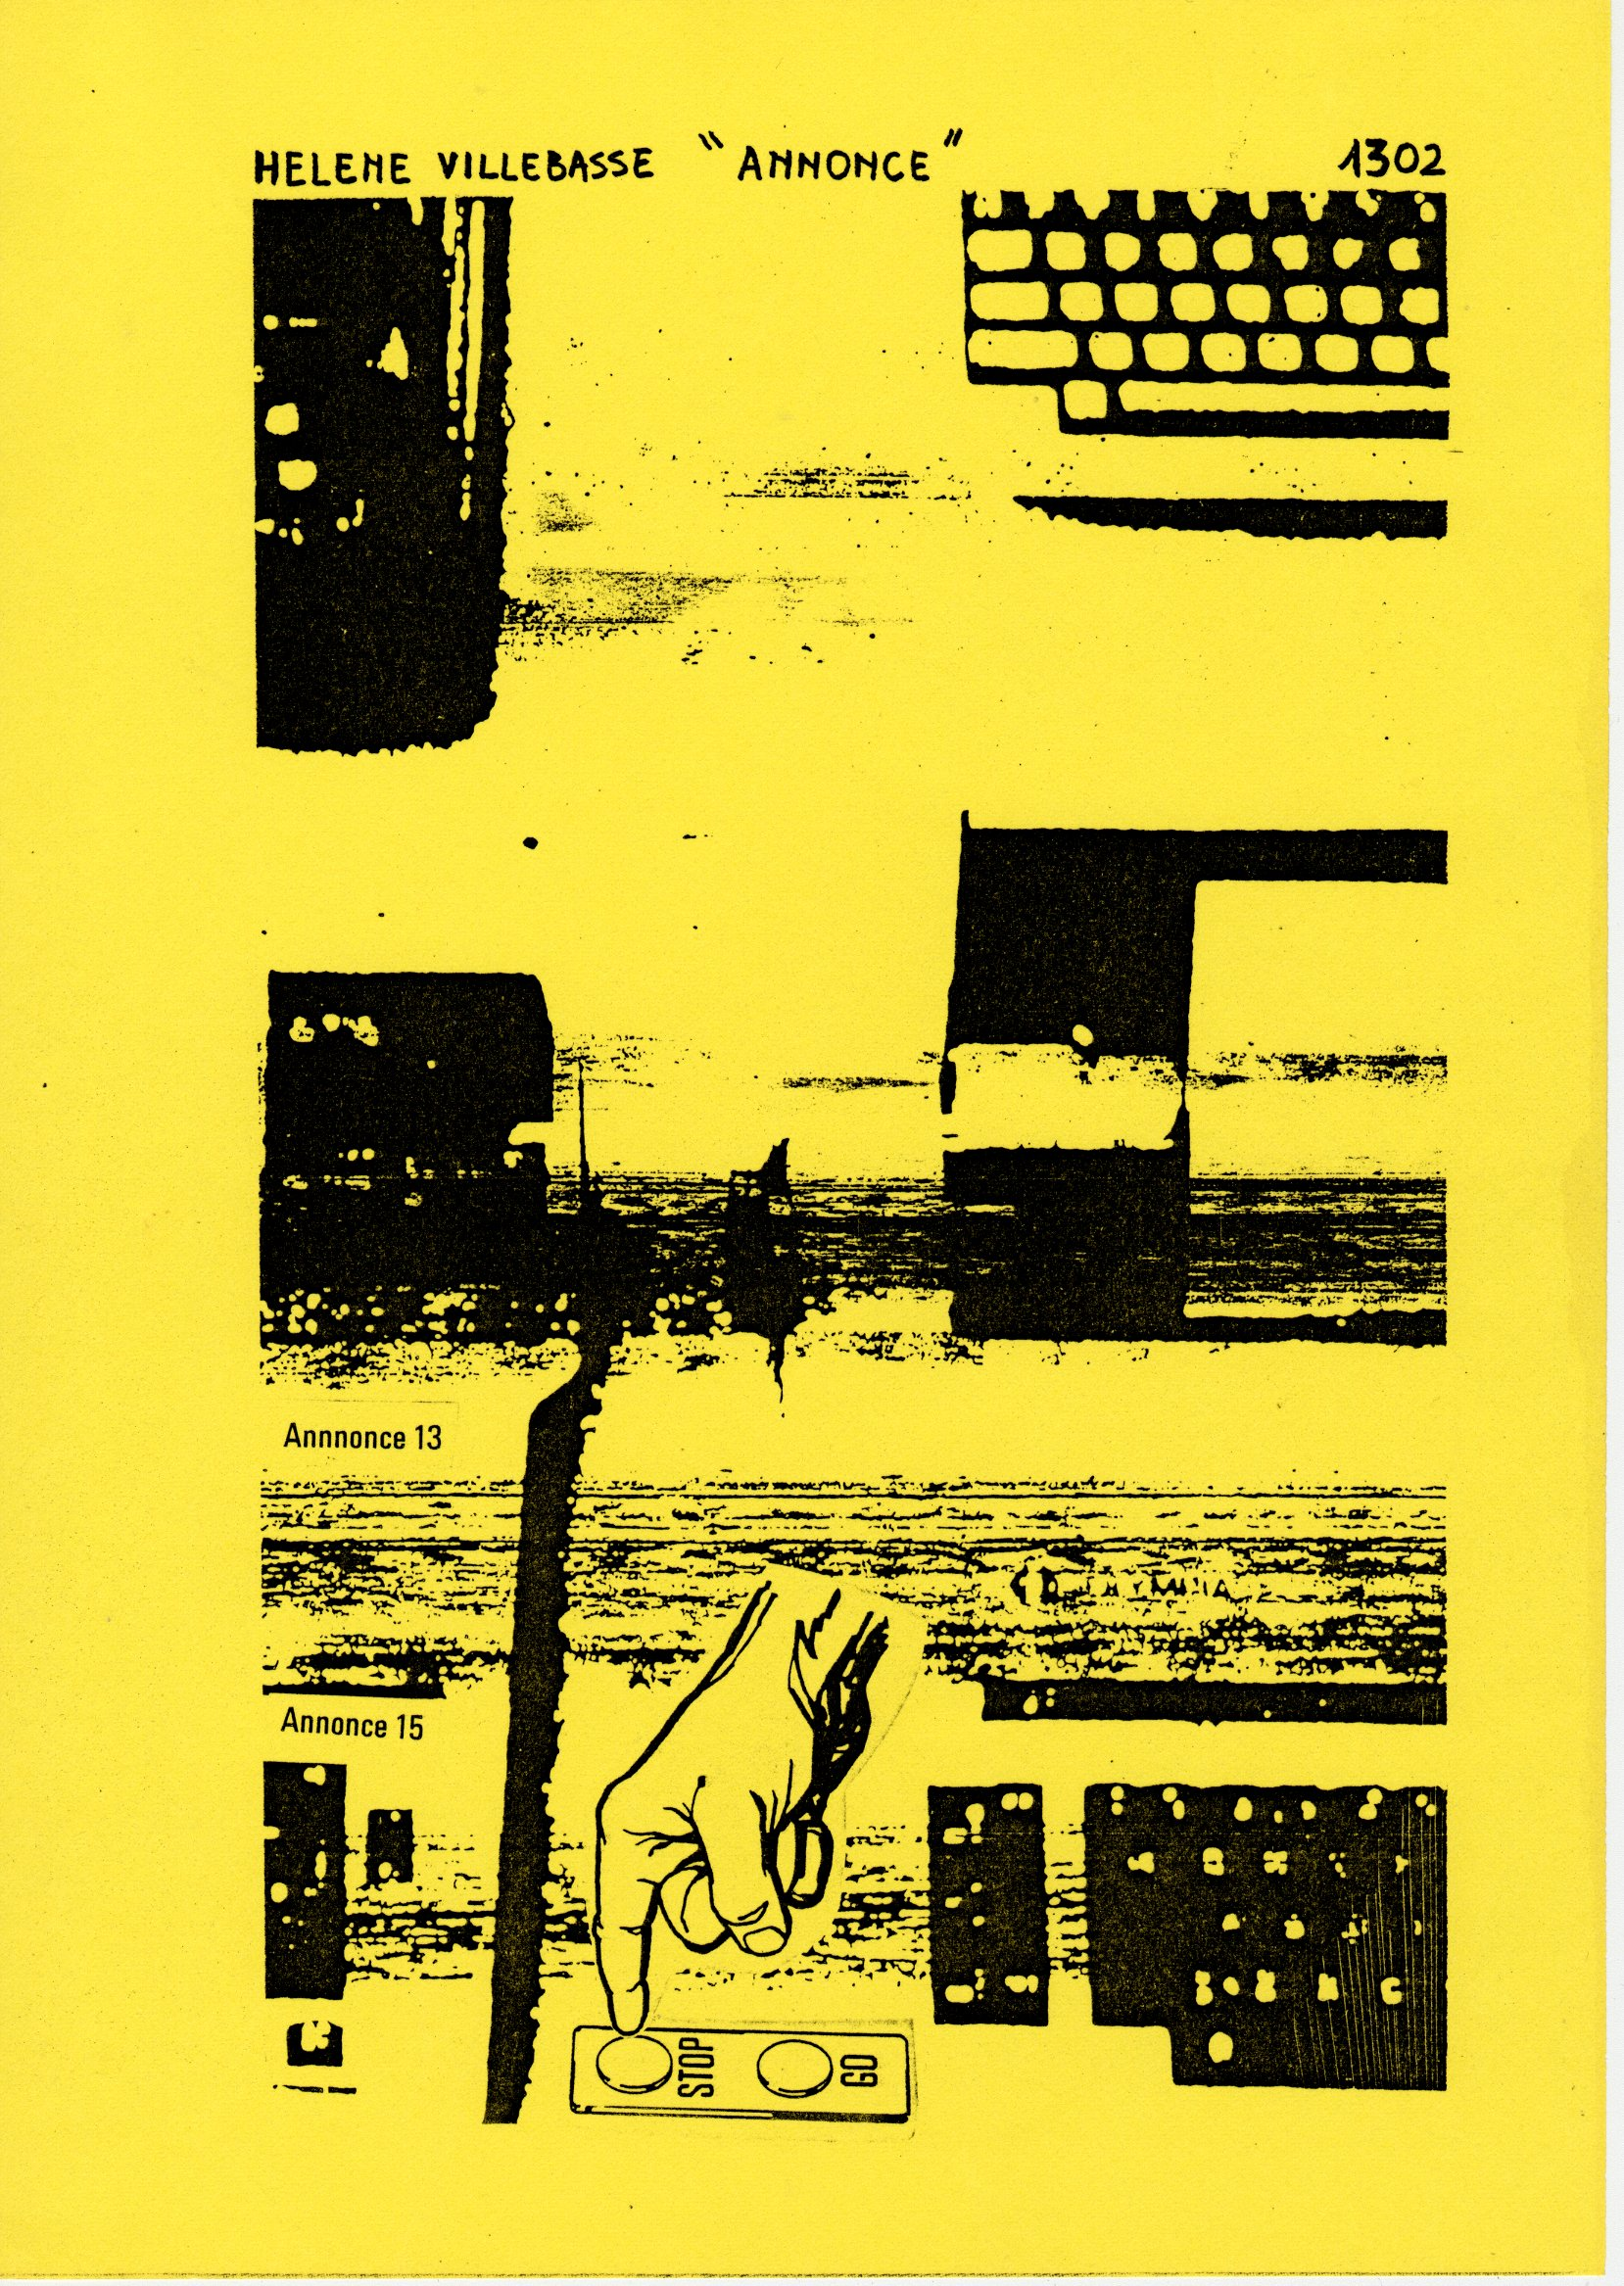 page 1302 H. Villebasse ANNONCE